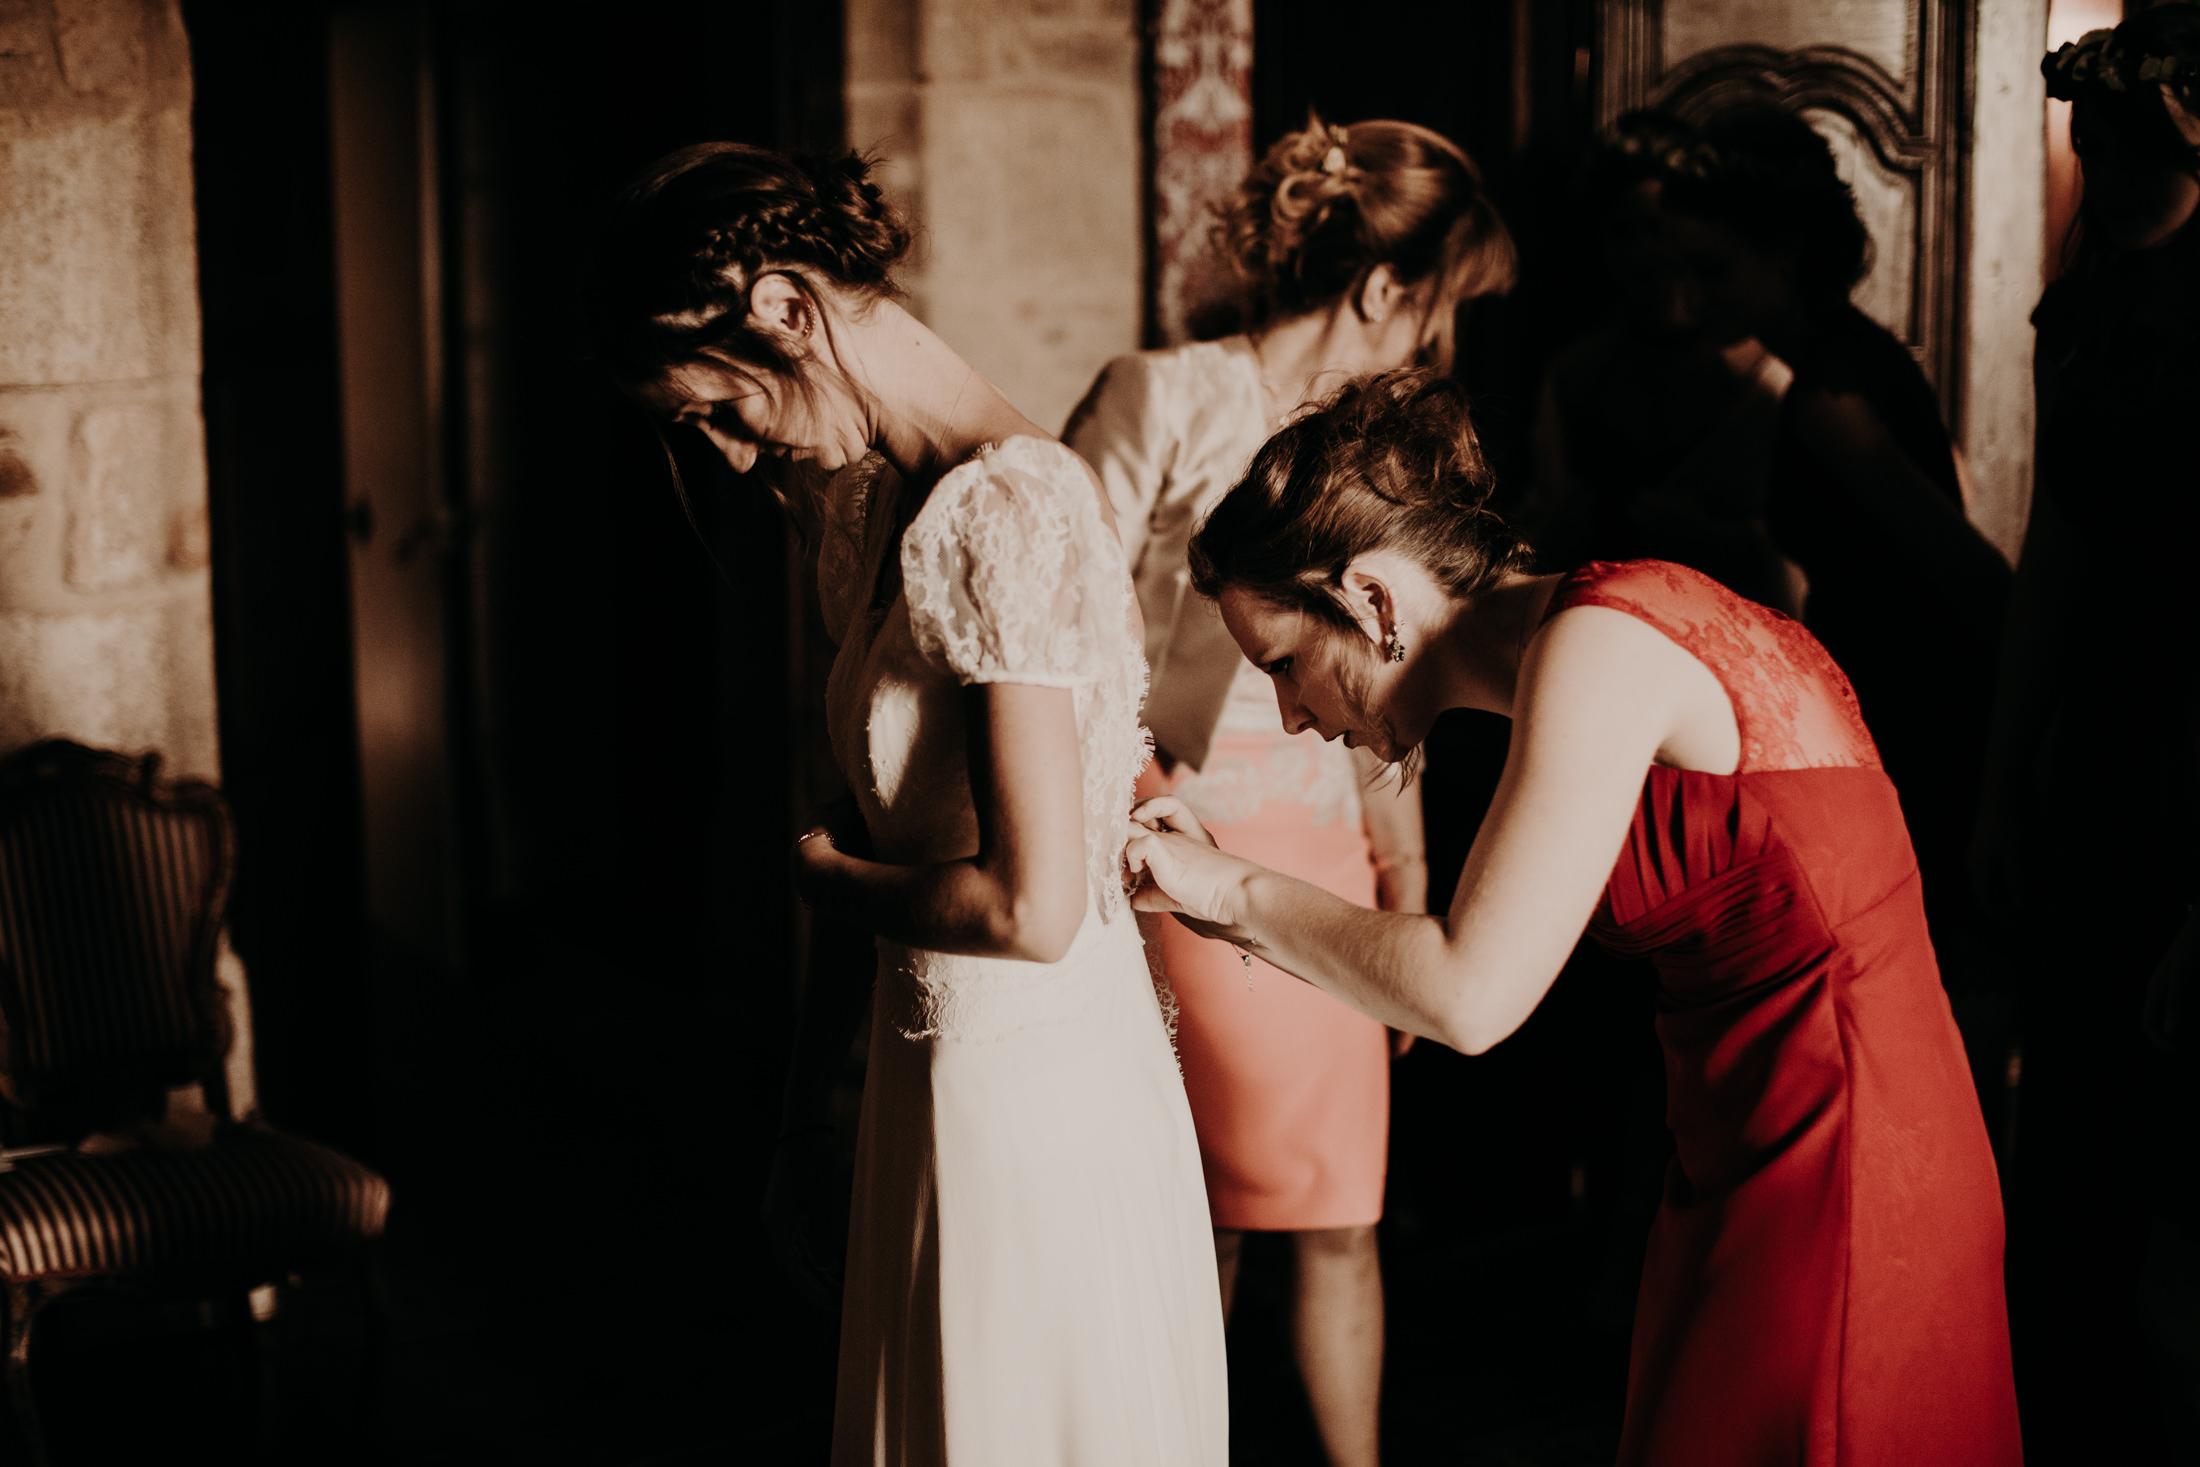 Mariage auvergne photographe wedding_-13.jpg